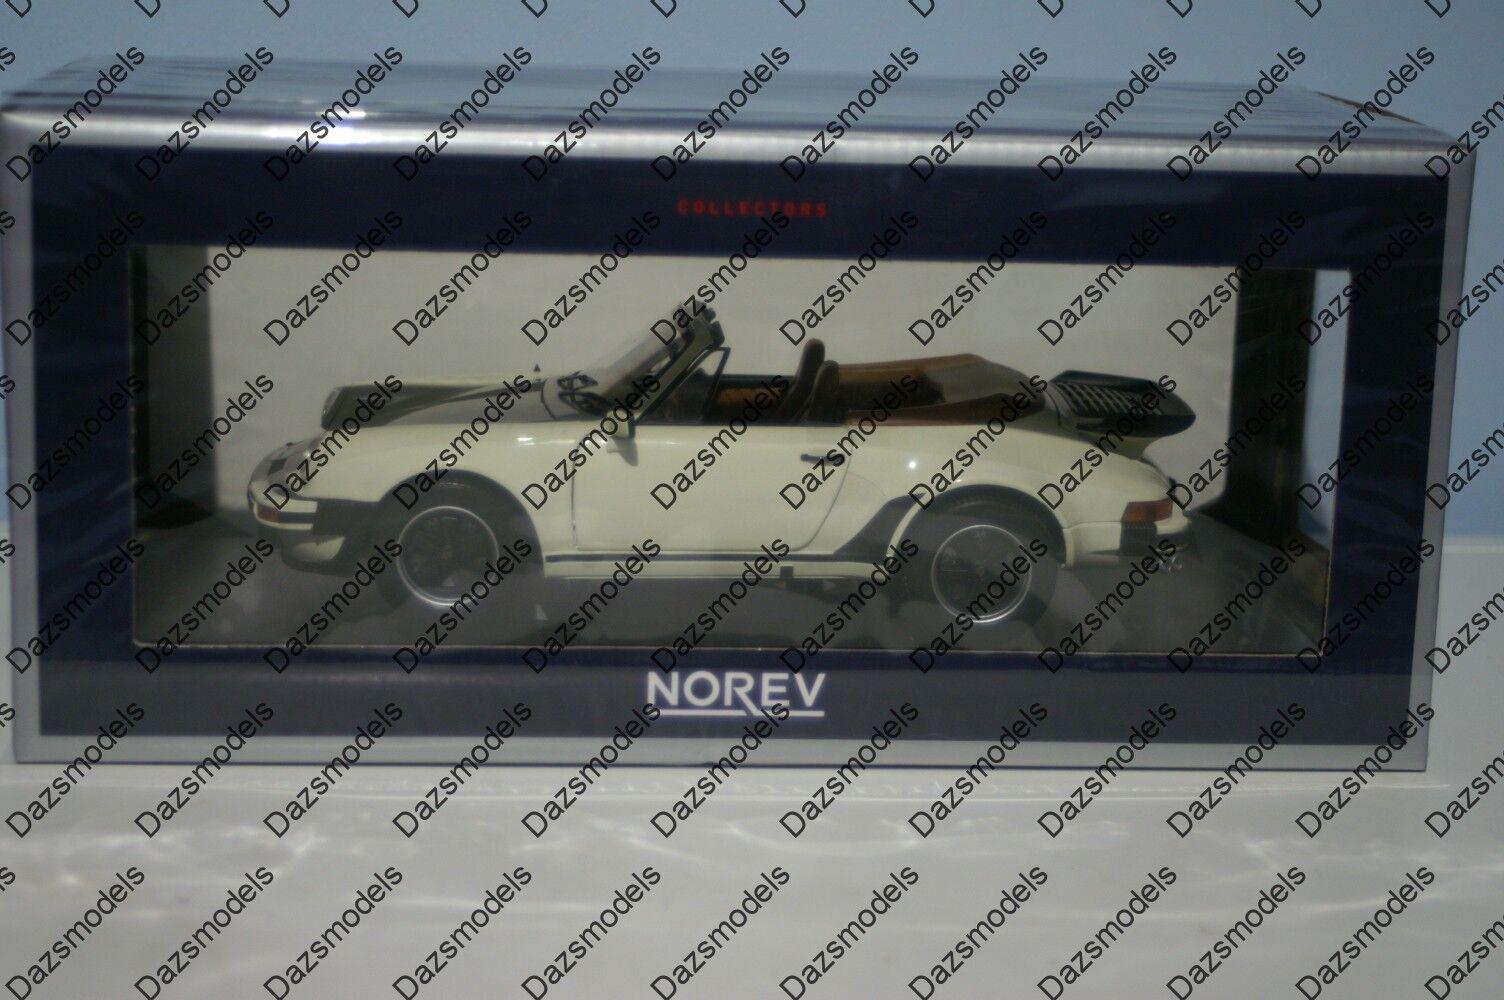 Norev Porsche 911 Turbo Cabriolet 1987 vit 1 18 skala 187661